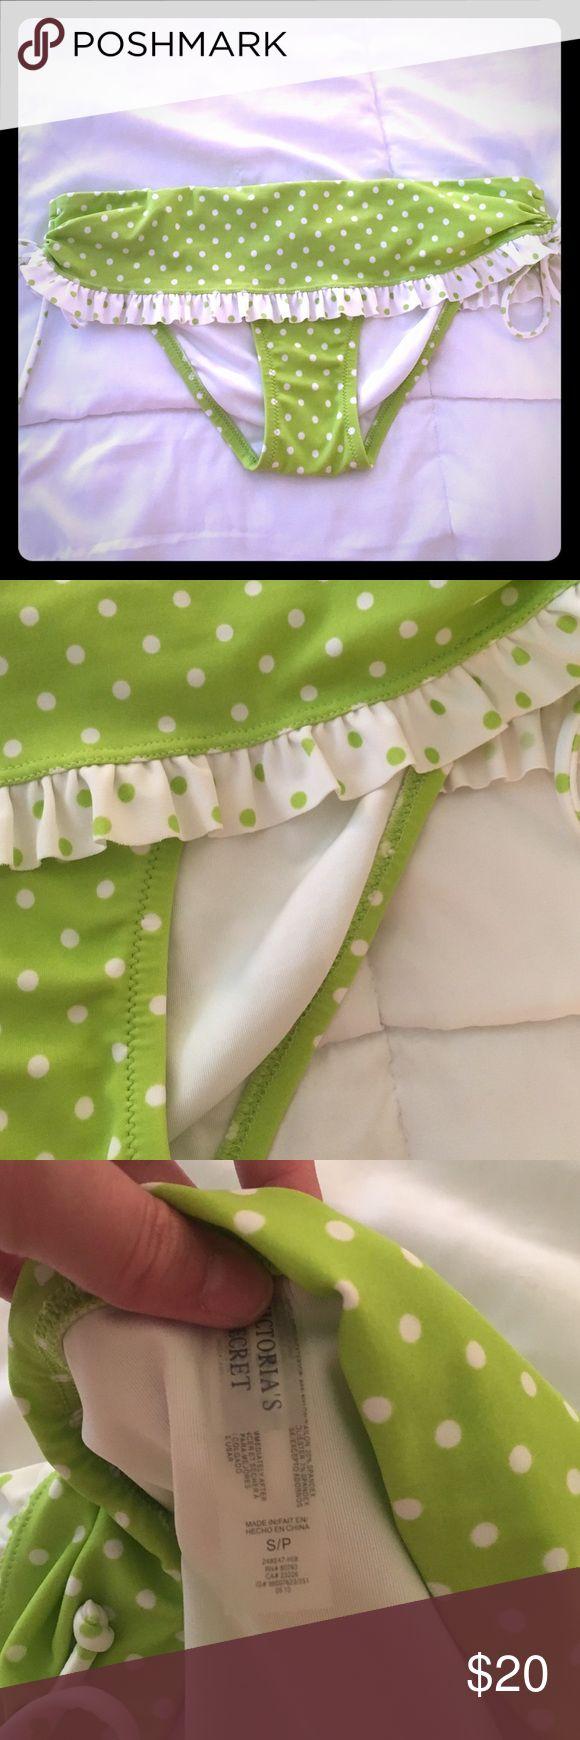 Size S VS Polka Dot Ruffle Bikini Bottom Like new! No flaws! Cute citrus green with ruffles! NO TRADES. NO MODELING. PRICE IS FIRM. Victoria's Secret Swim Bikinis